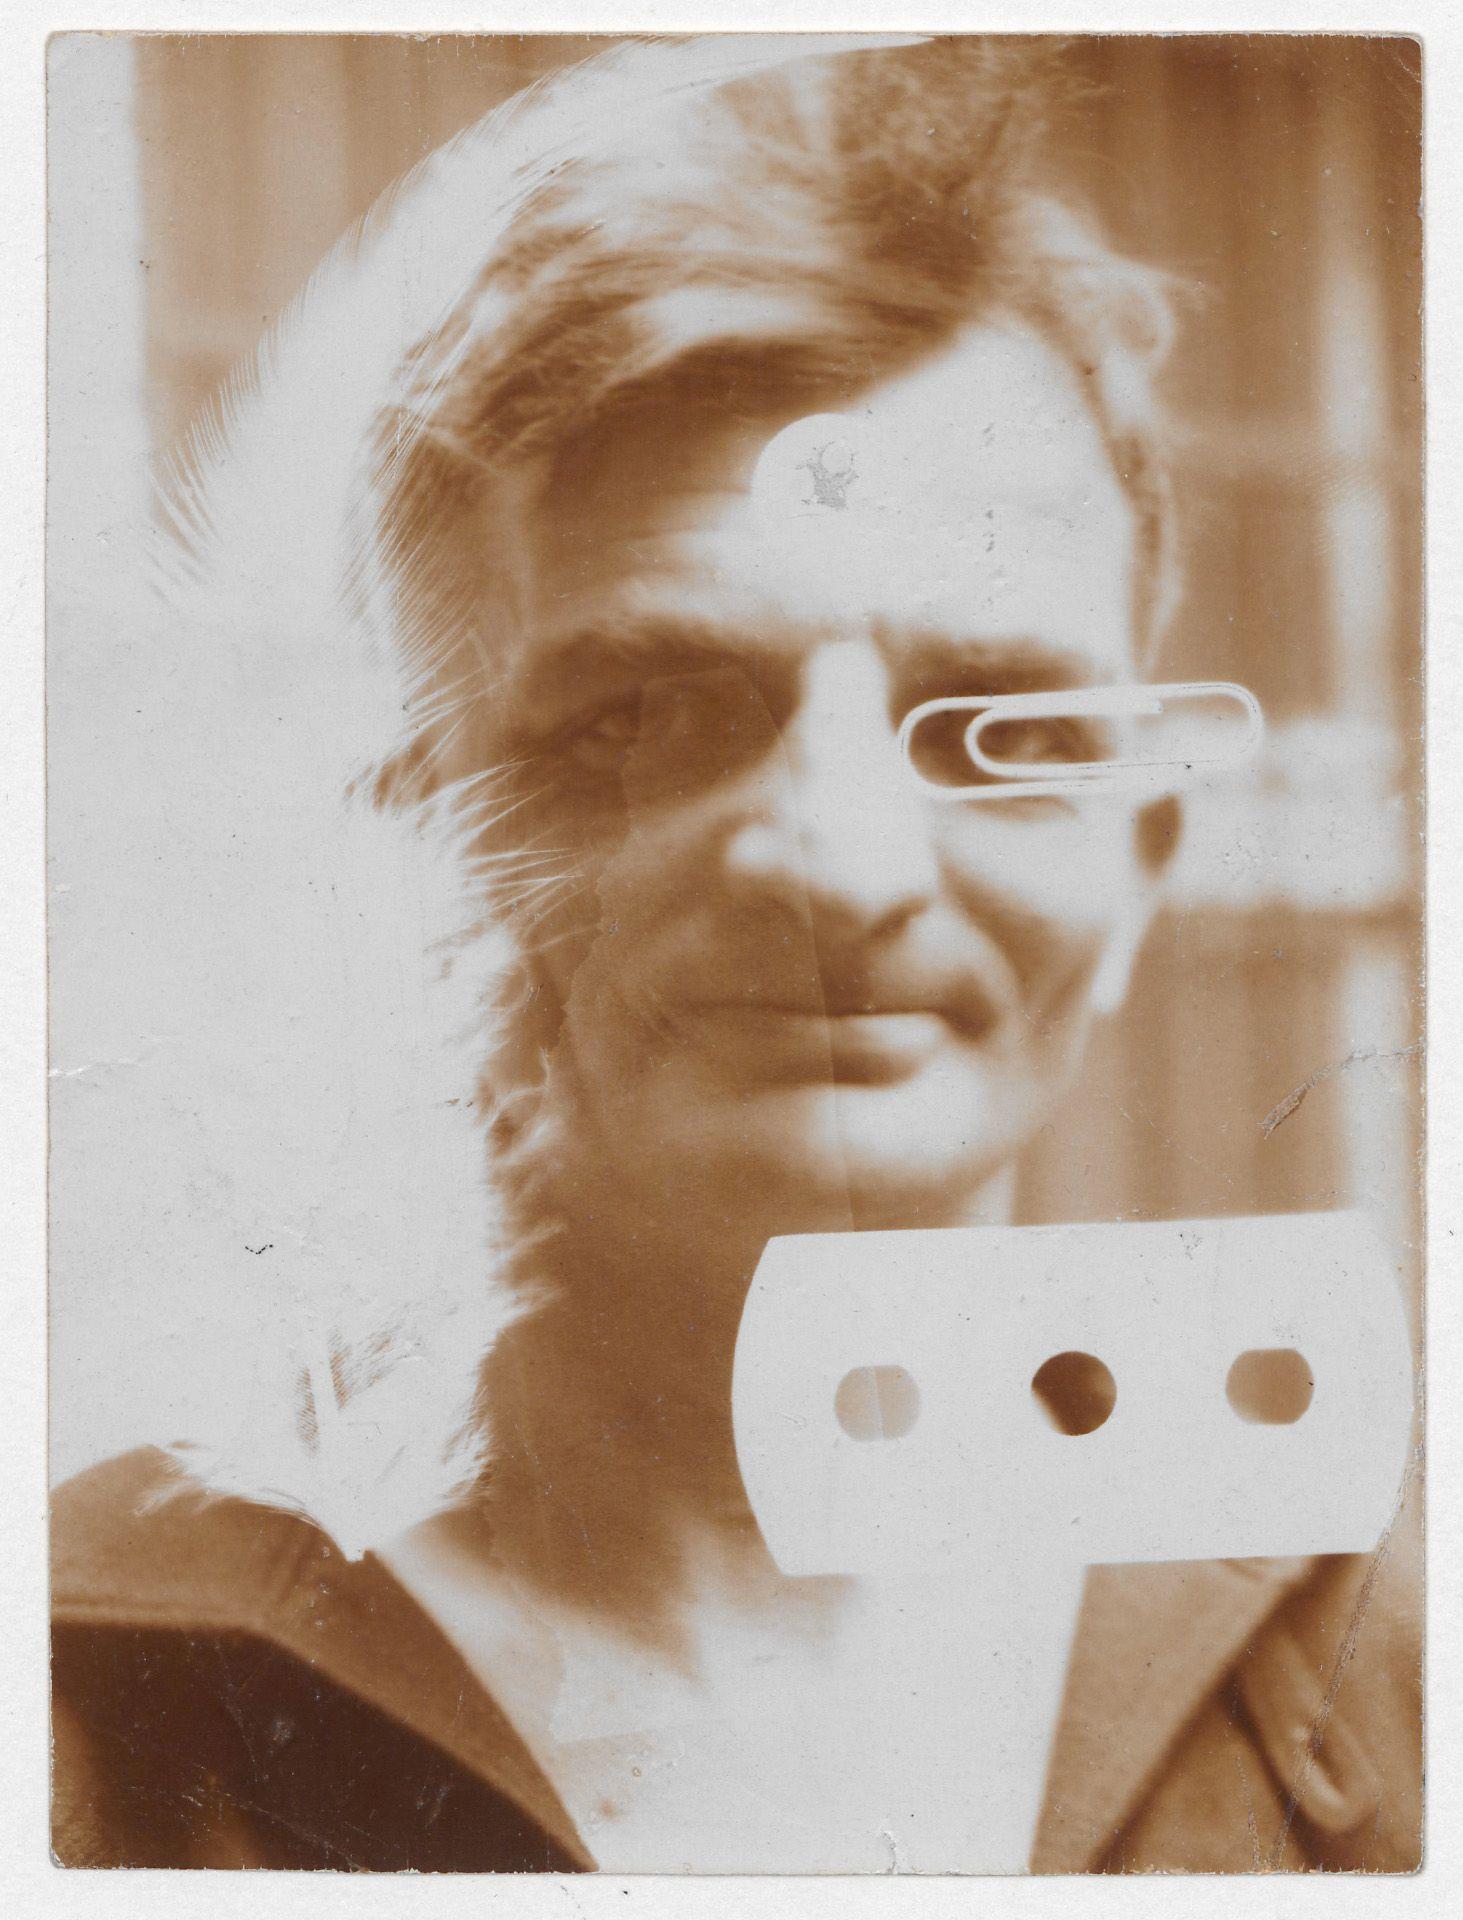 UMBO: Porträt Joachim Ringelnatz, um 1928. Kollodiumpapier. Sprengel Museum Hannover. Leihgabe Fritz-Behrens-Stiftung, Hannover 2016. Repro: Herling/Werner/Sprengel Museum Hannover. Copyright: Phyllis Umbehr/Galerie Kicken Berlin/ VG Bild-Kunst, Bonn 2019.